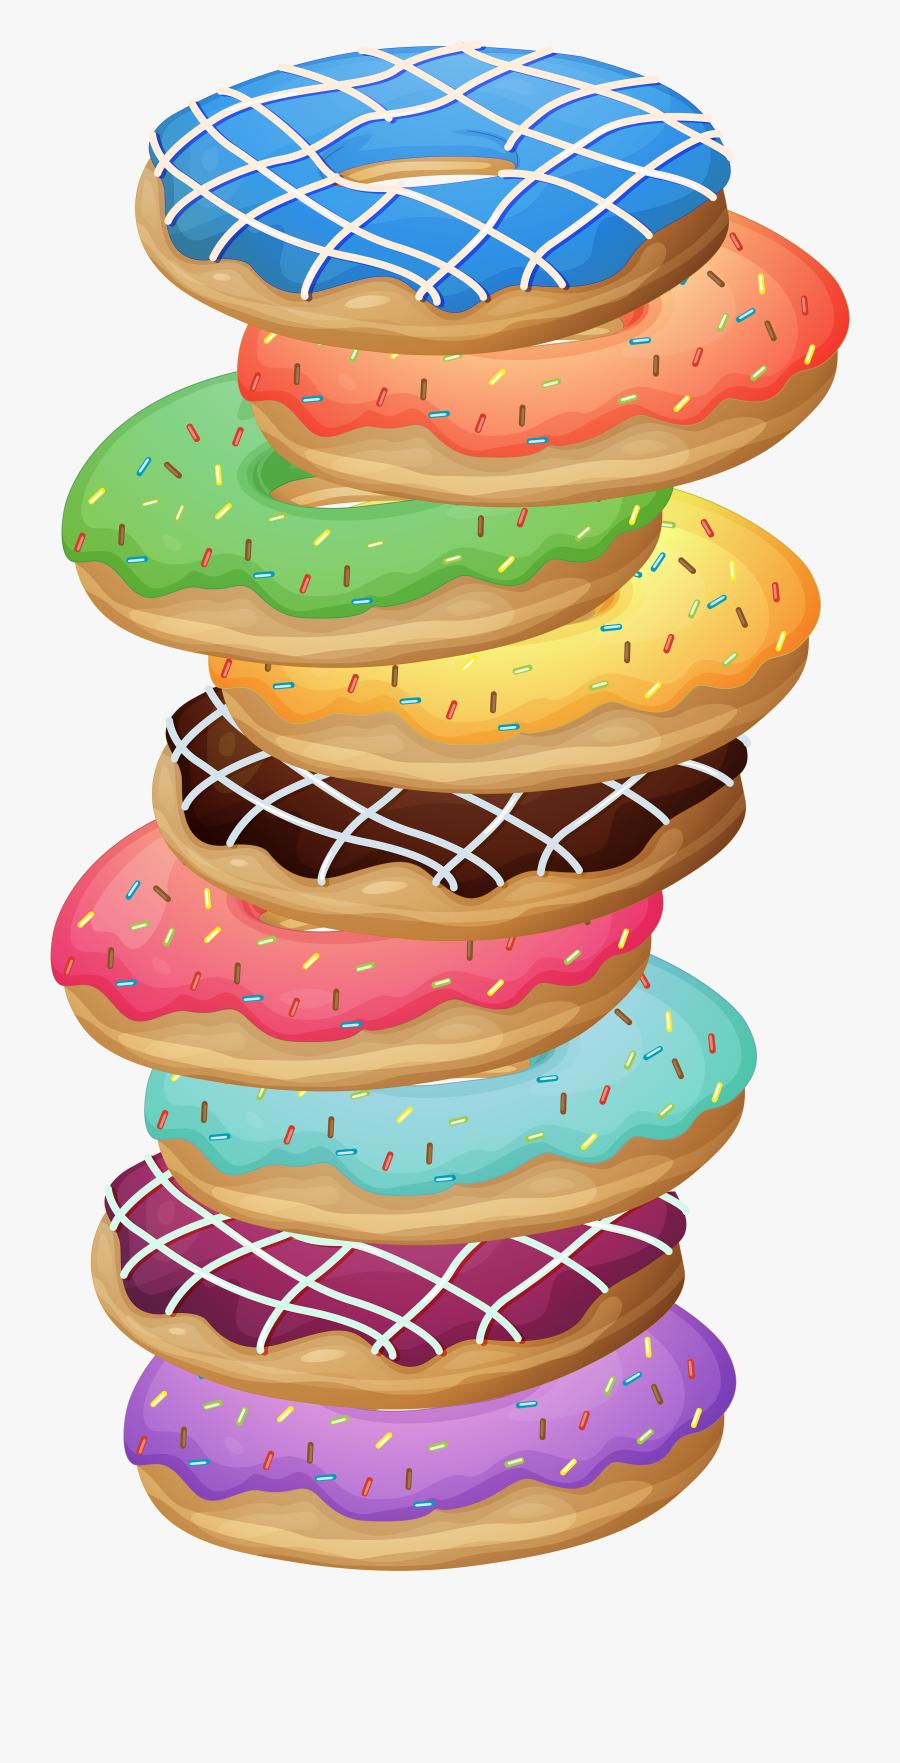 Transparent Donut Clipart Png - Stack Of Cookies Clip Art, Transparent Clipart